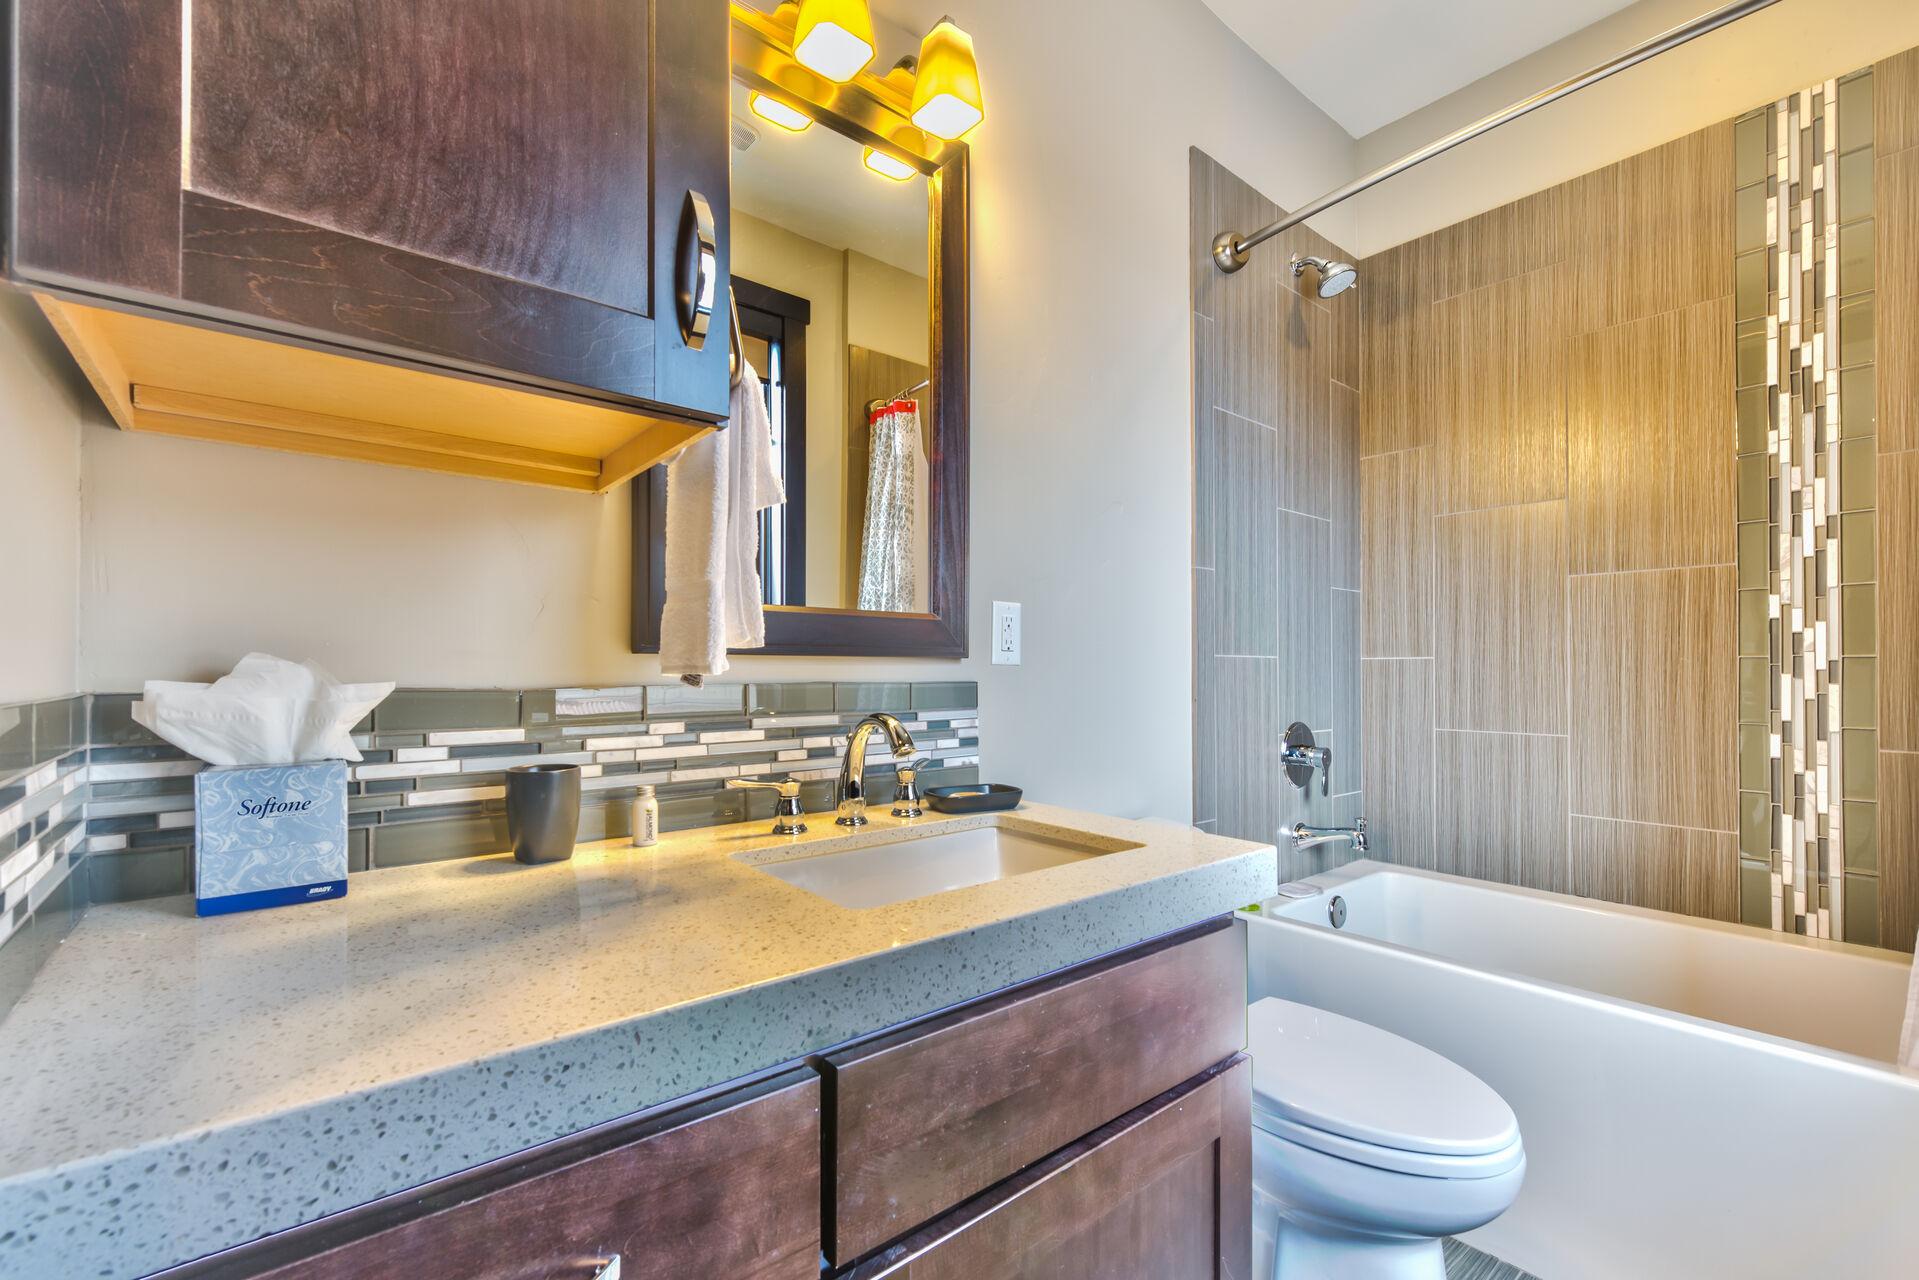 Shared Full Bathroom off Kitchen area